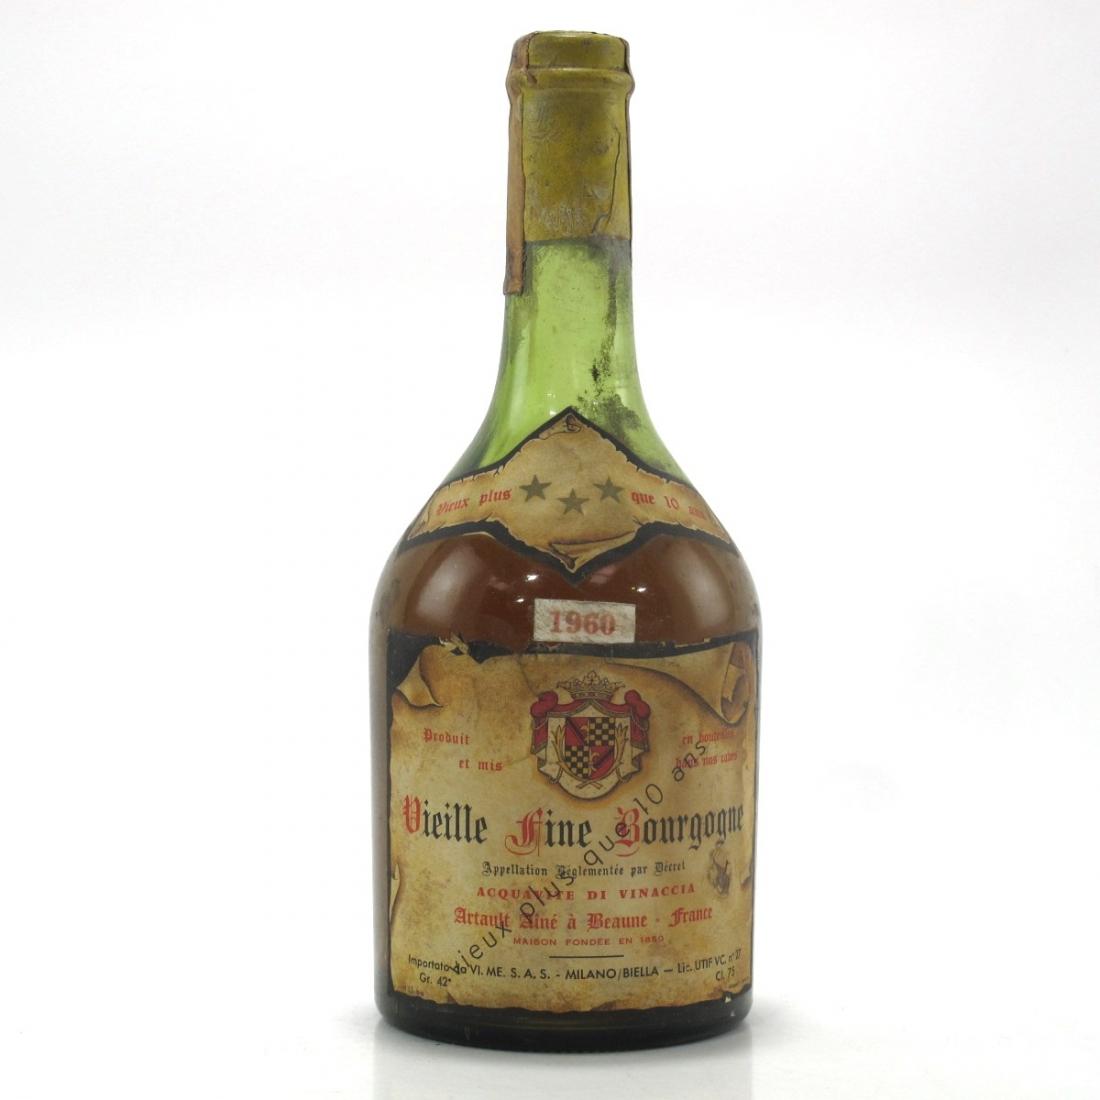 Artault Aine a Beaune 1960 Vielle Fine Bourgogne